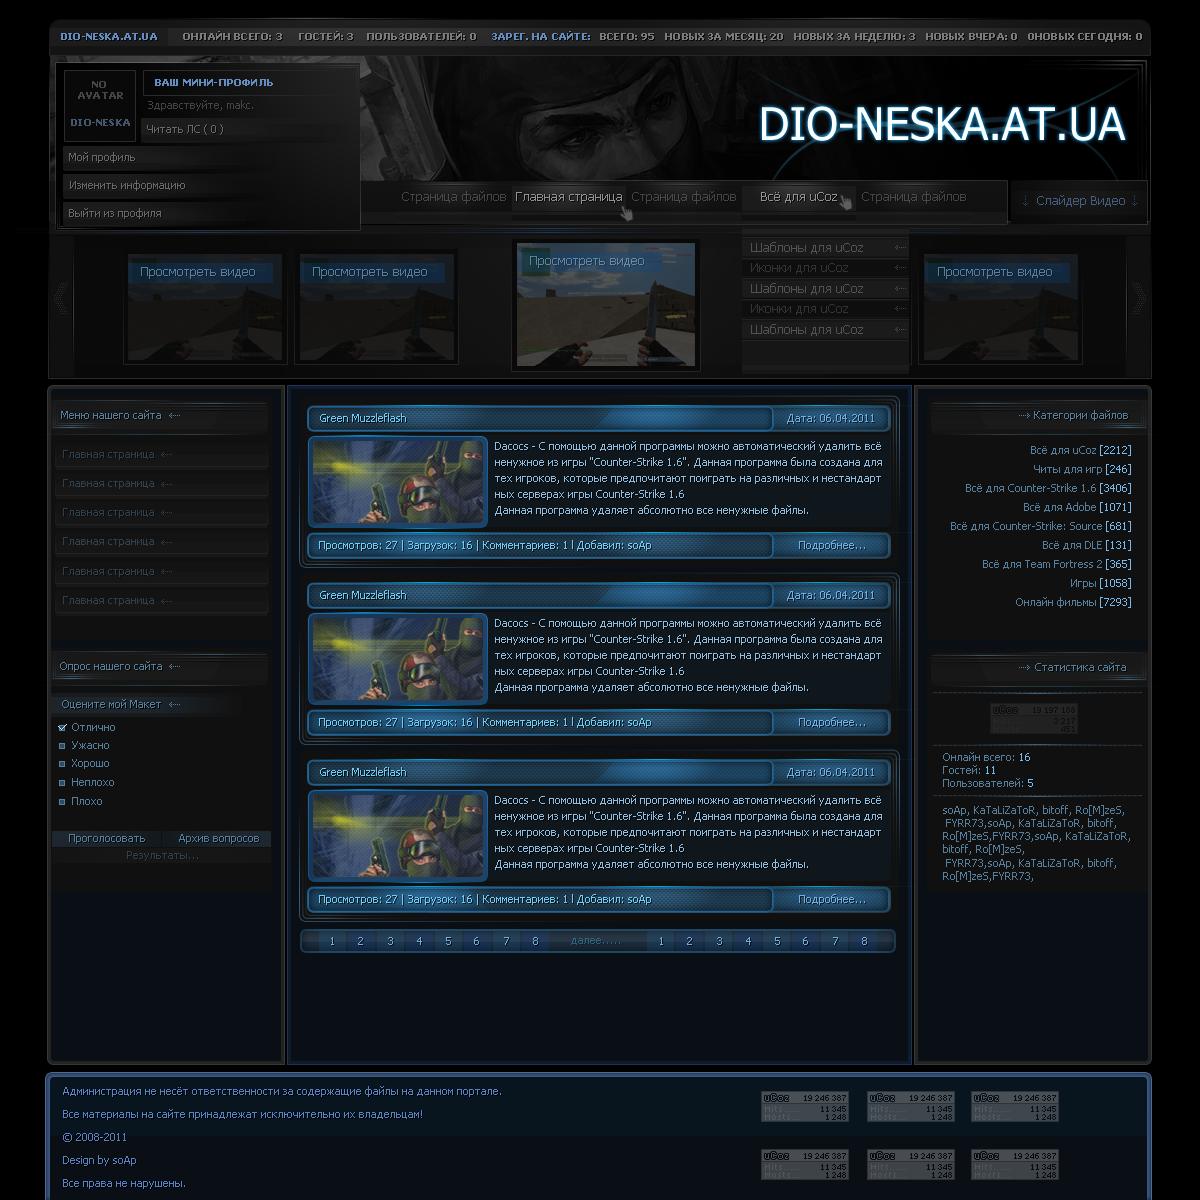 Уникальный шаблон сайта DIO-NESKA